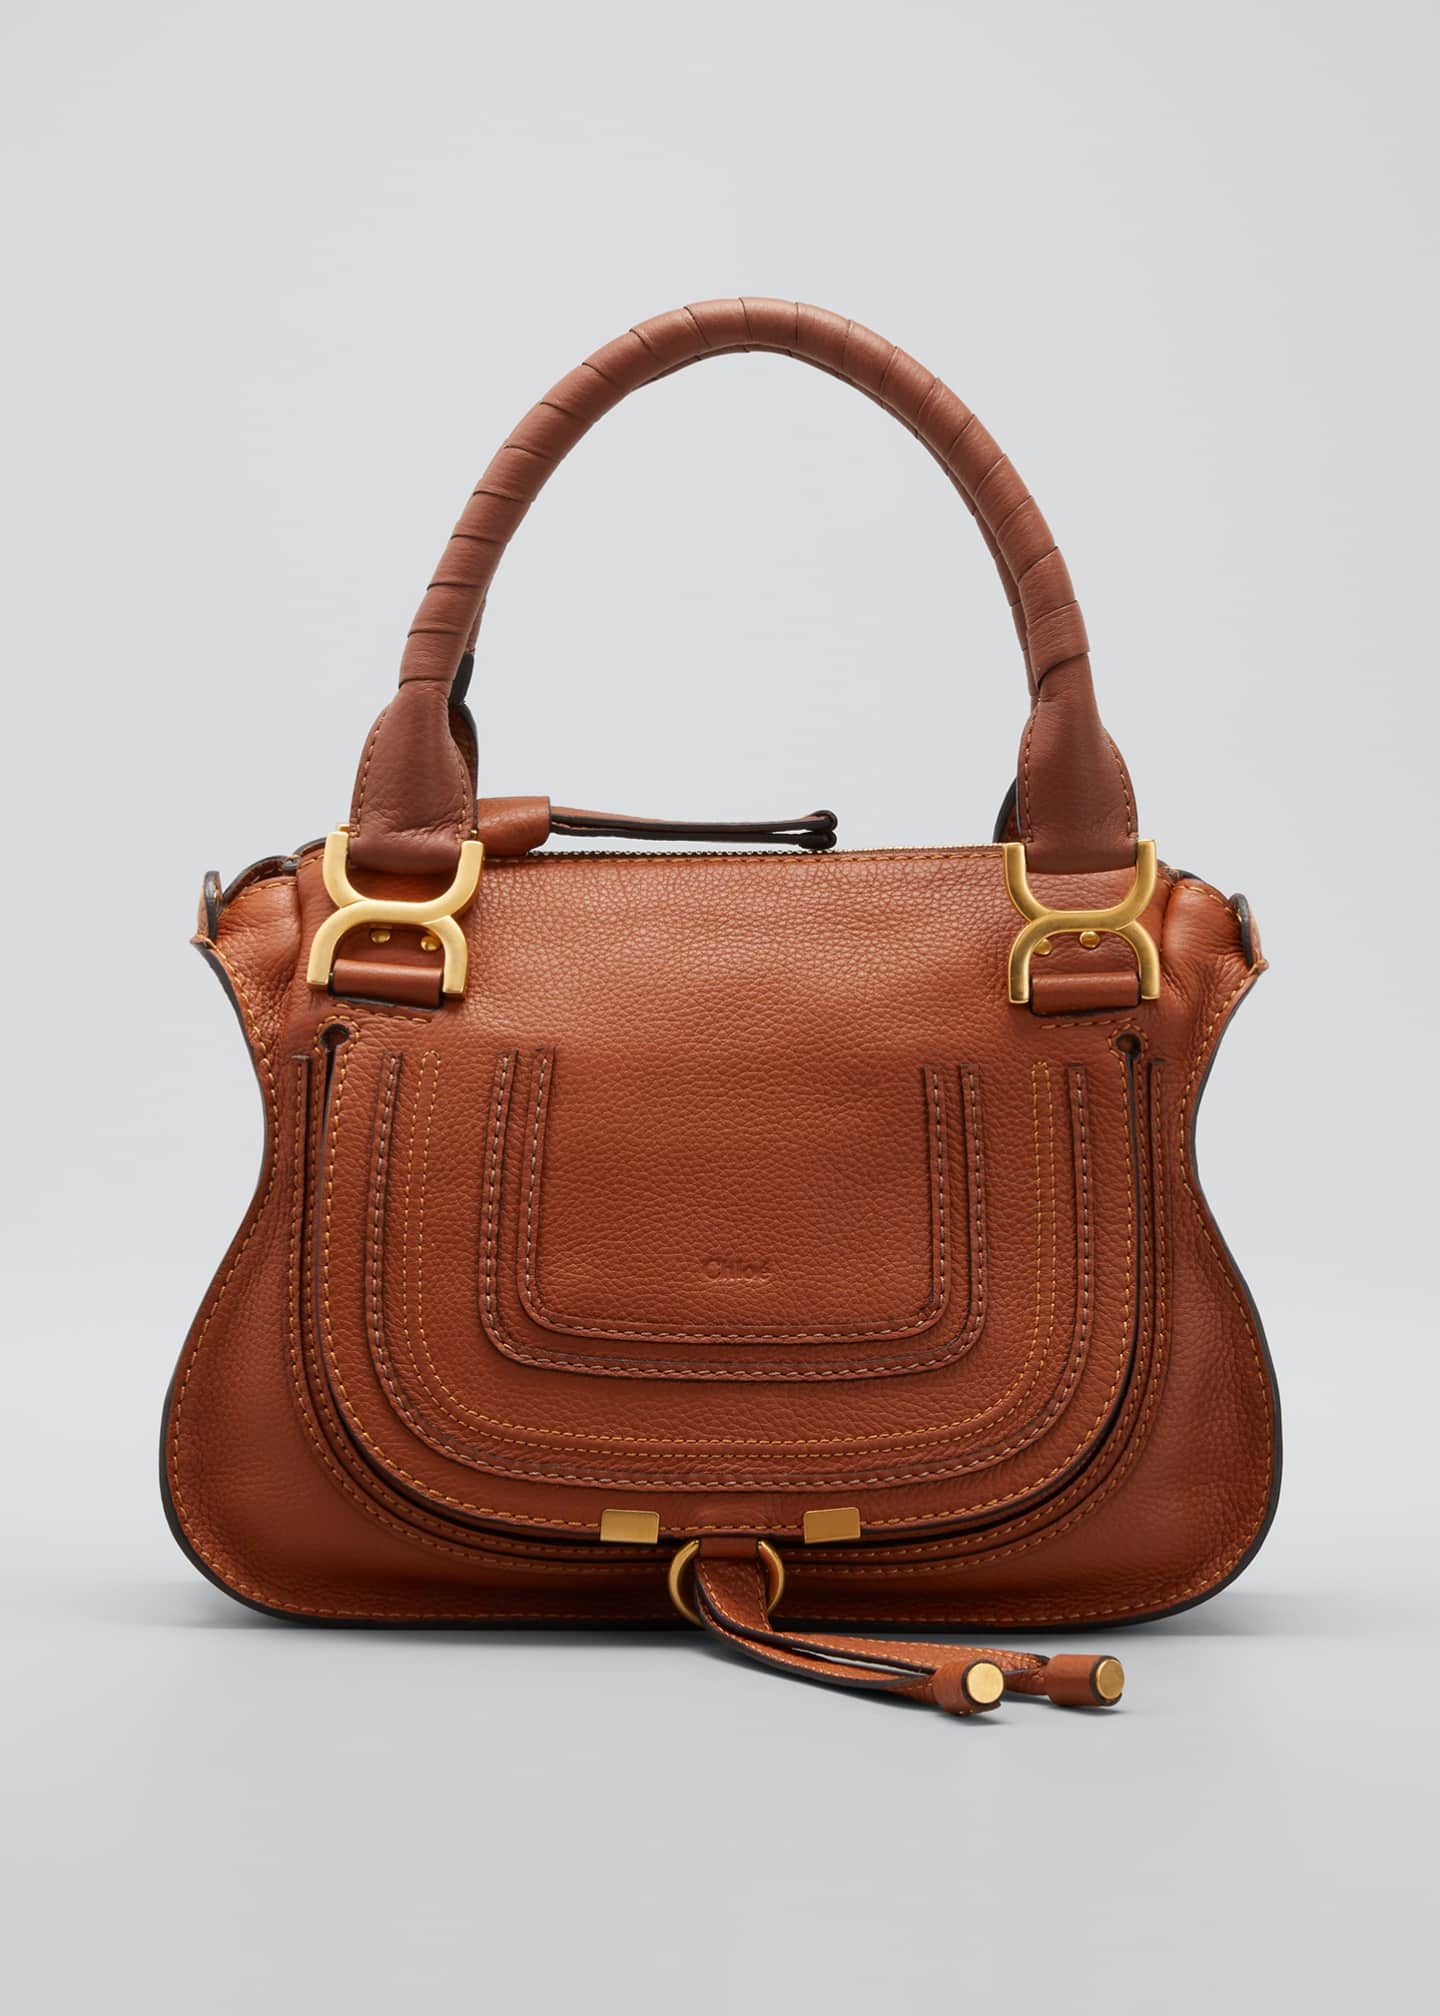 Chloe Marcie Small Double-Carry Satchel Bag